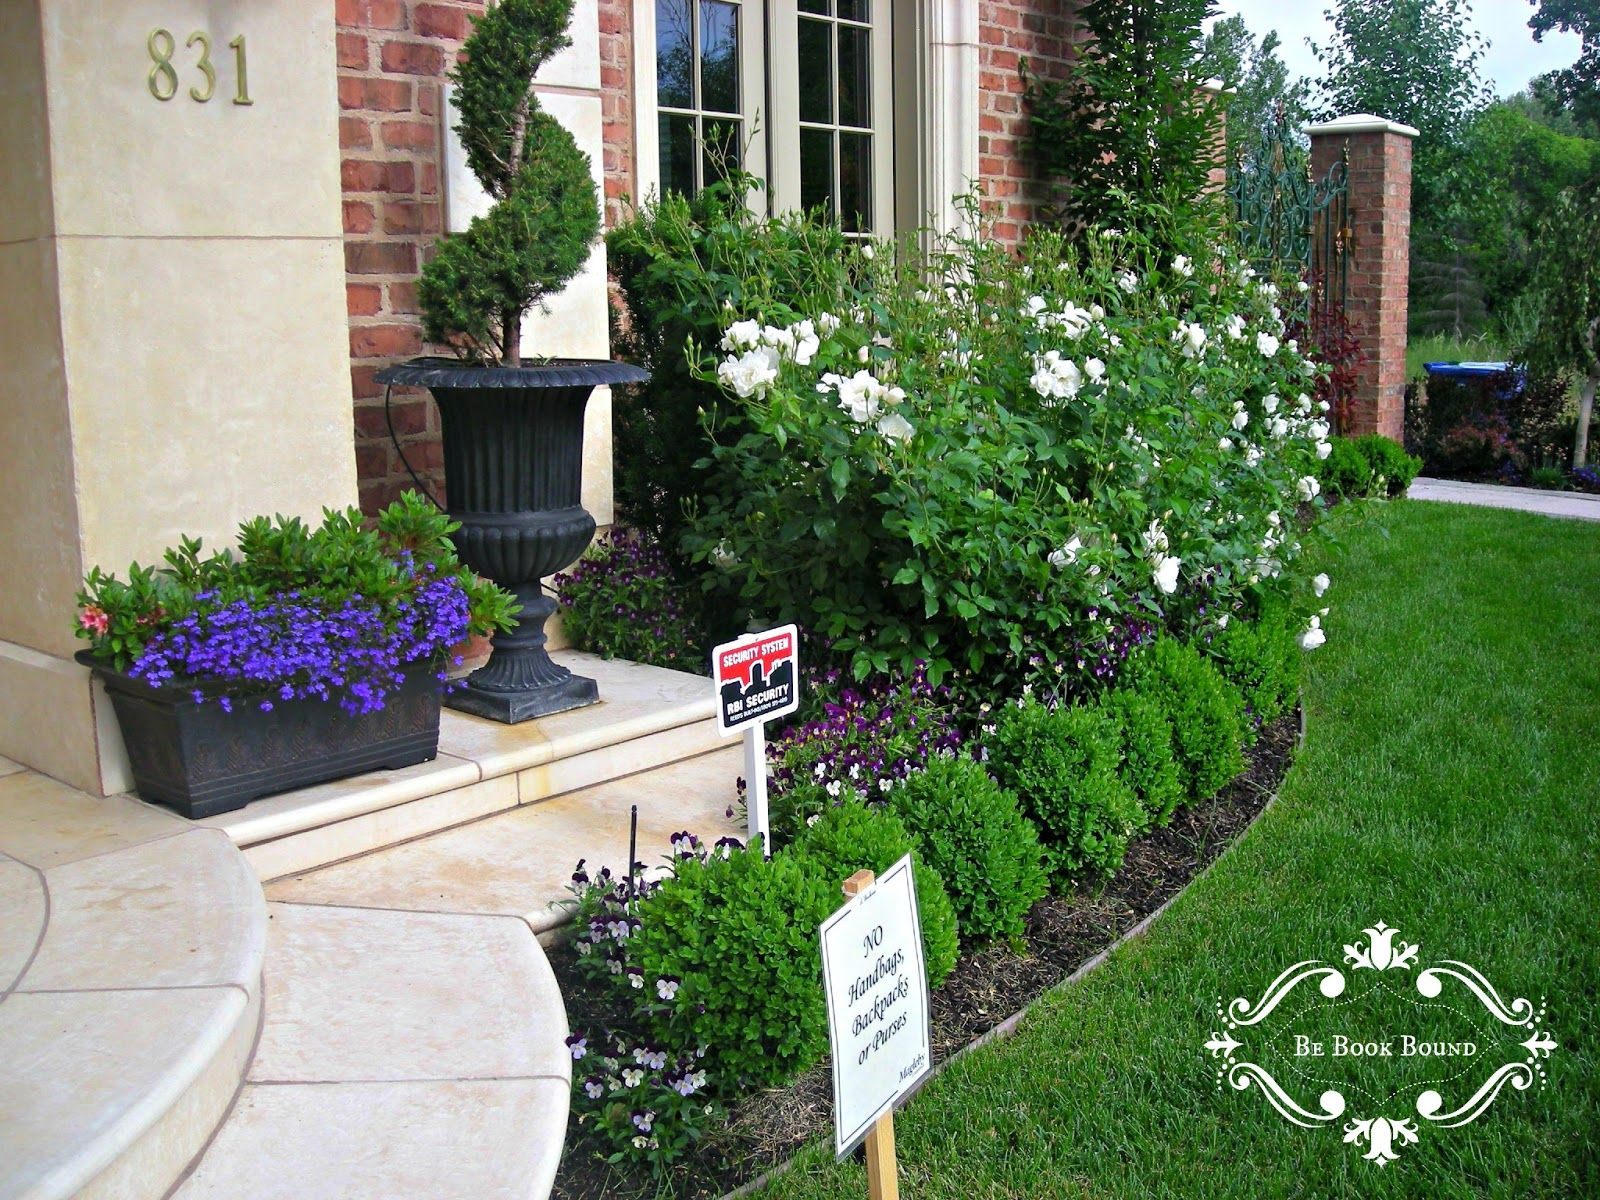 Home garden design flower  Flower Beds Front Yard Home Design Ideas Dokity  Garden  Pinterest